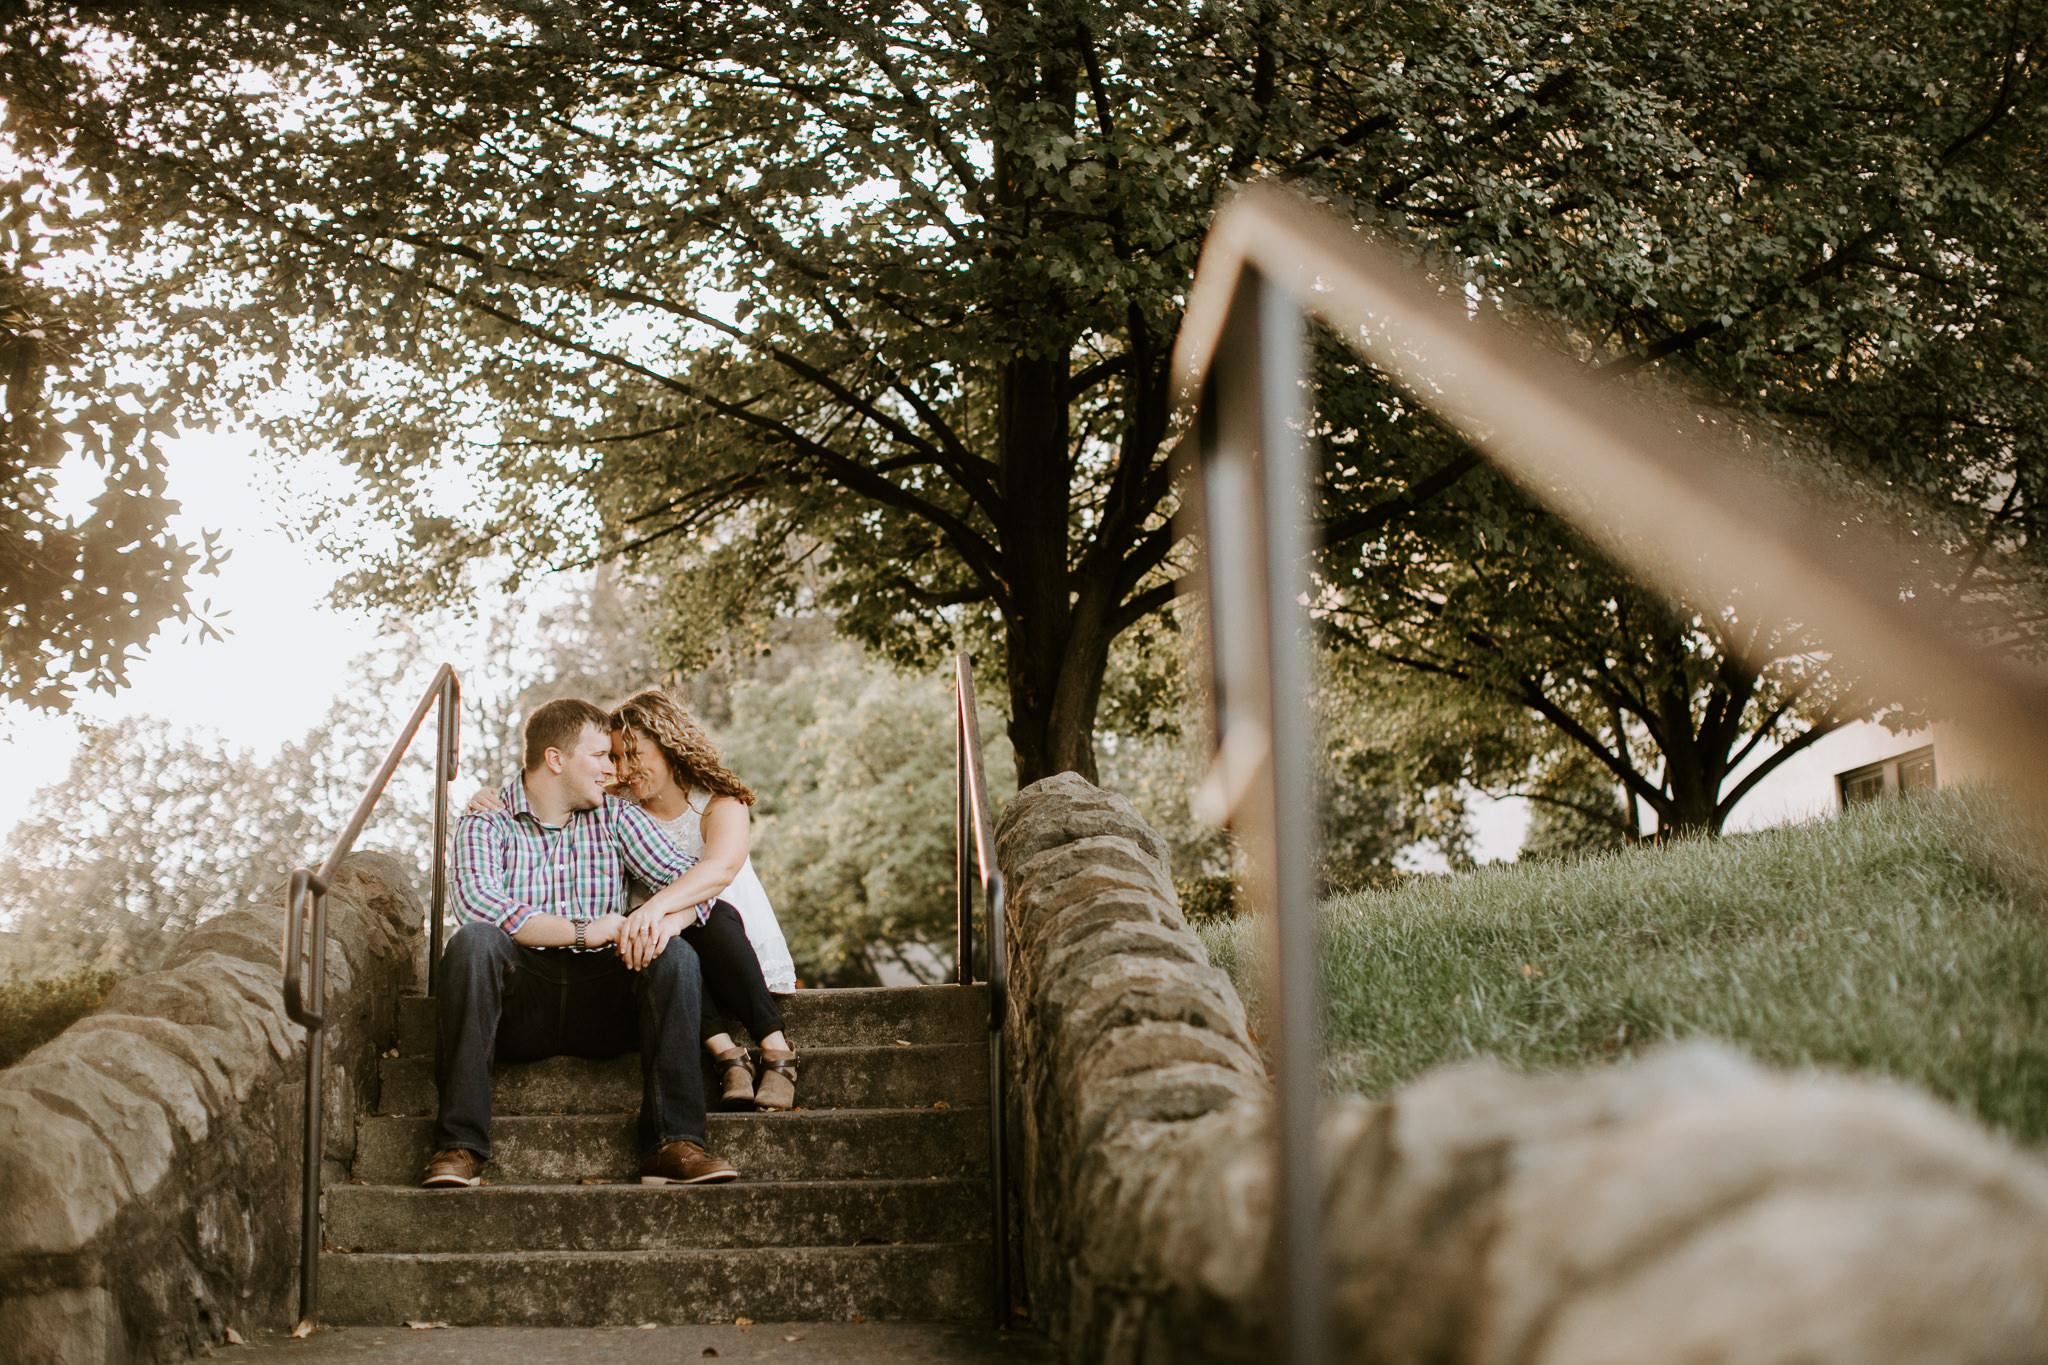 Roanoke - Engagement- Virginia wedding photographer - Pat Cori Photography-22.jpg